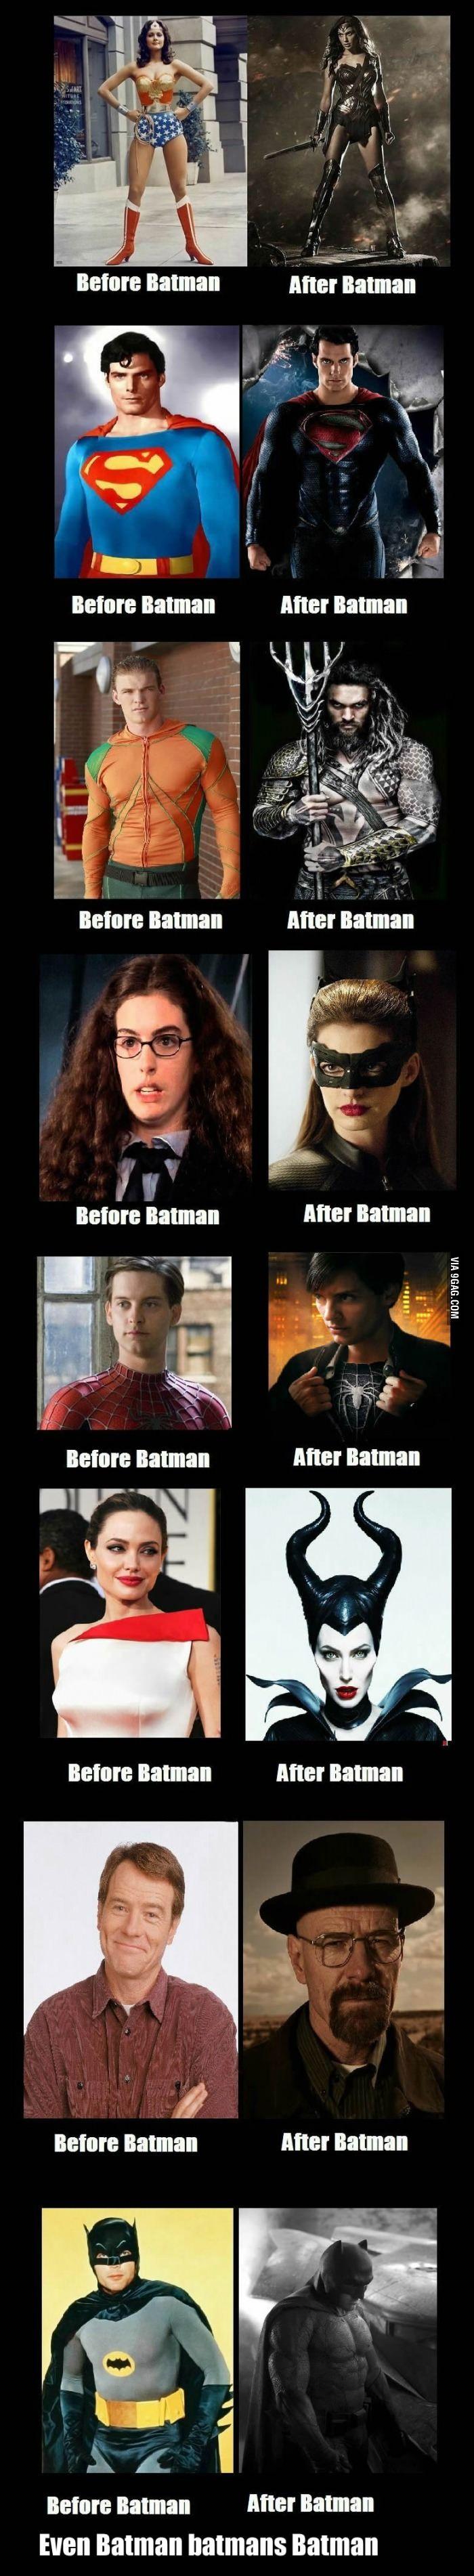 The Batman effect